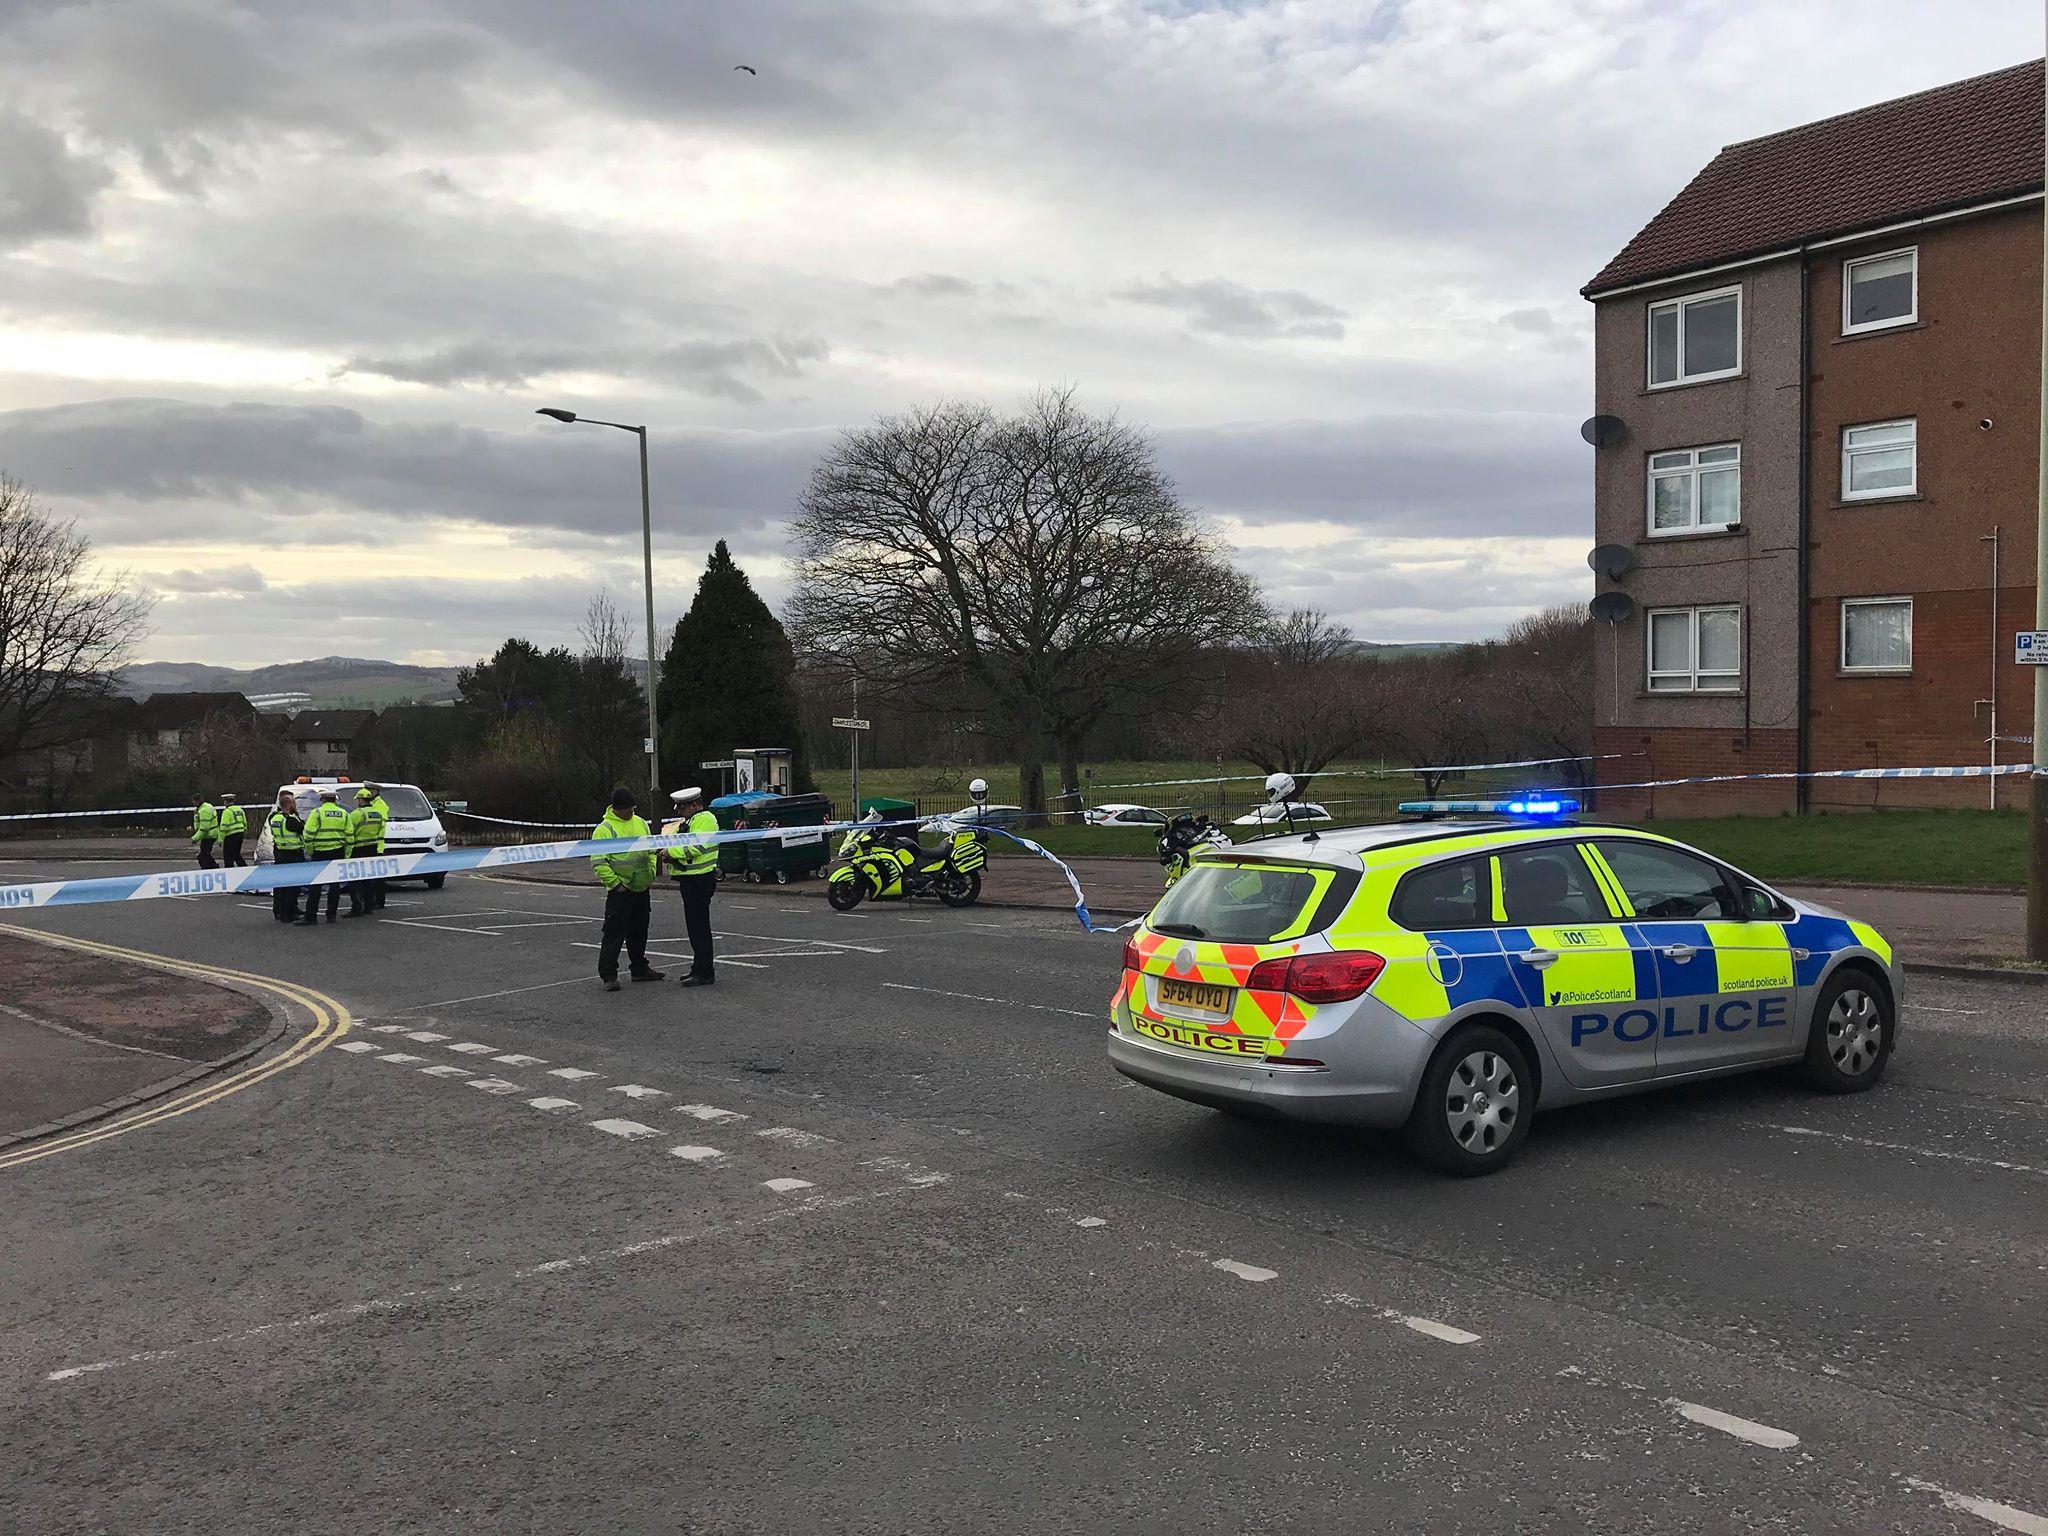 Police on the scene